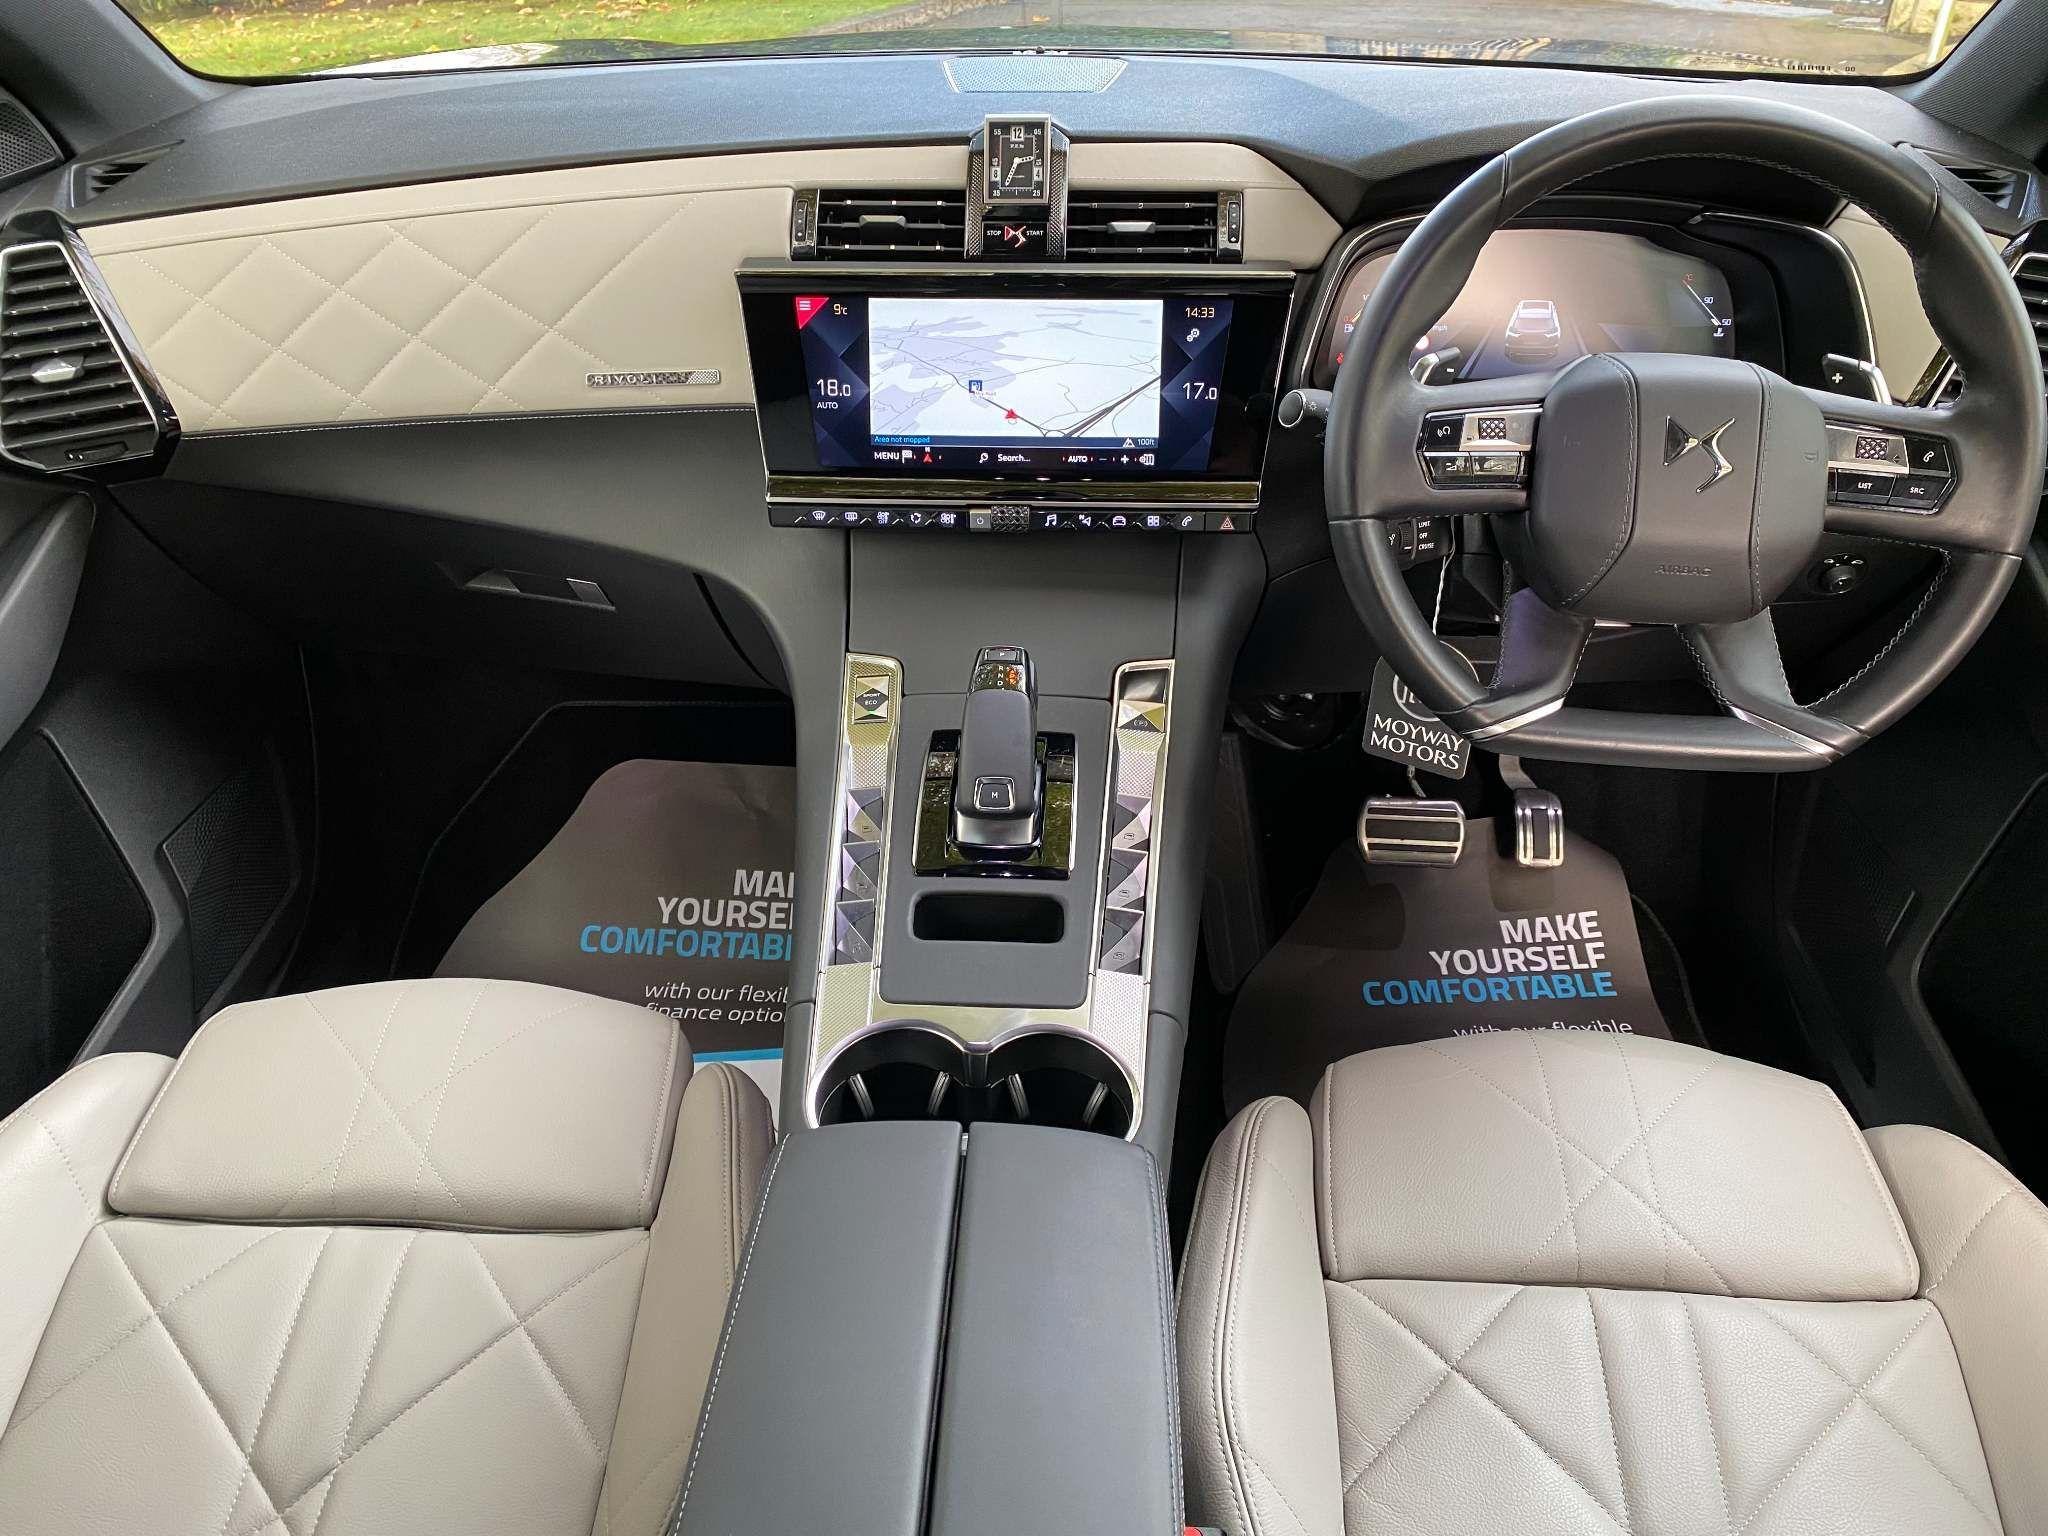 2020 DS Automobiles DS 7 CROSSBACK 1.5 BlueHDi Prestige Crossback EAT8 (s/s) 5dr Diesel Automatic – Moyway Motors Dungannon full